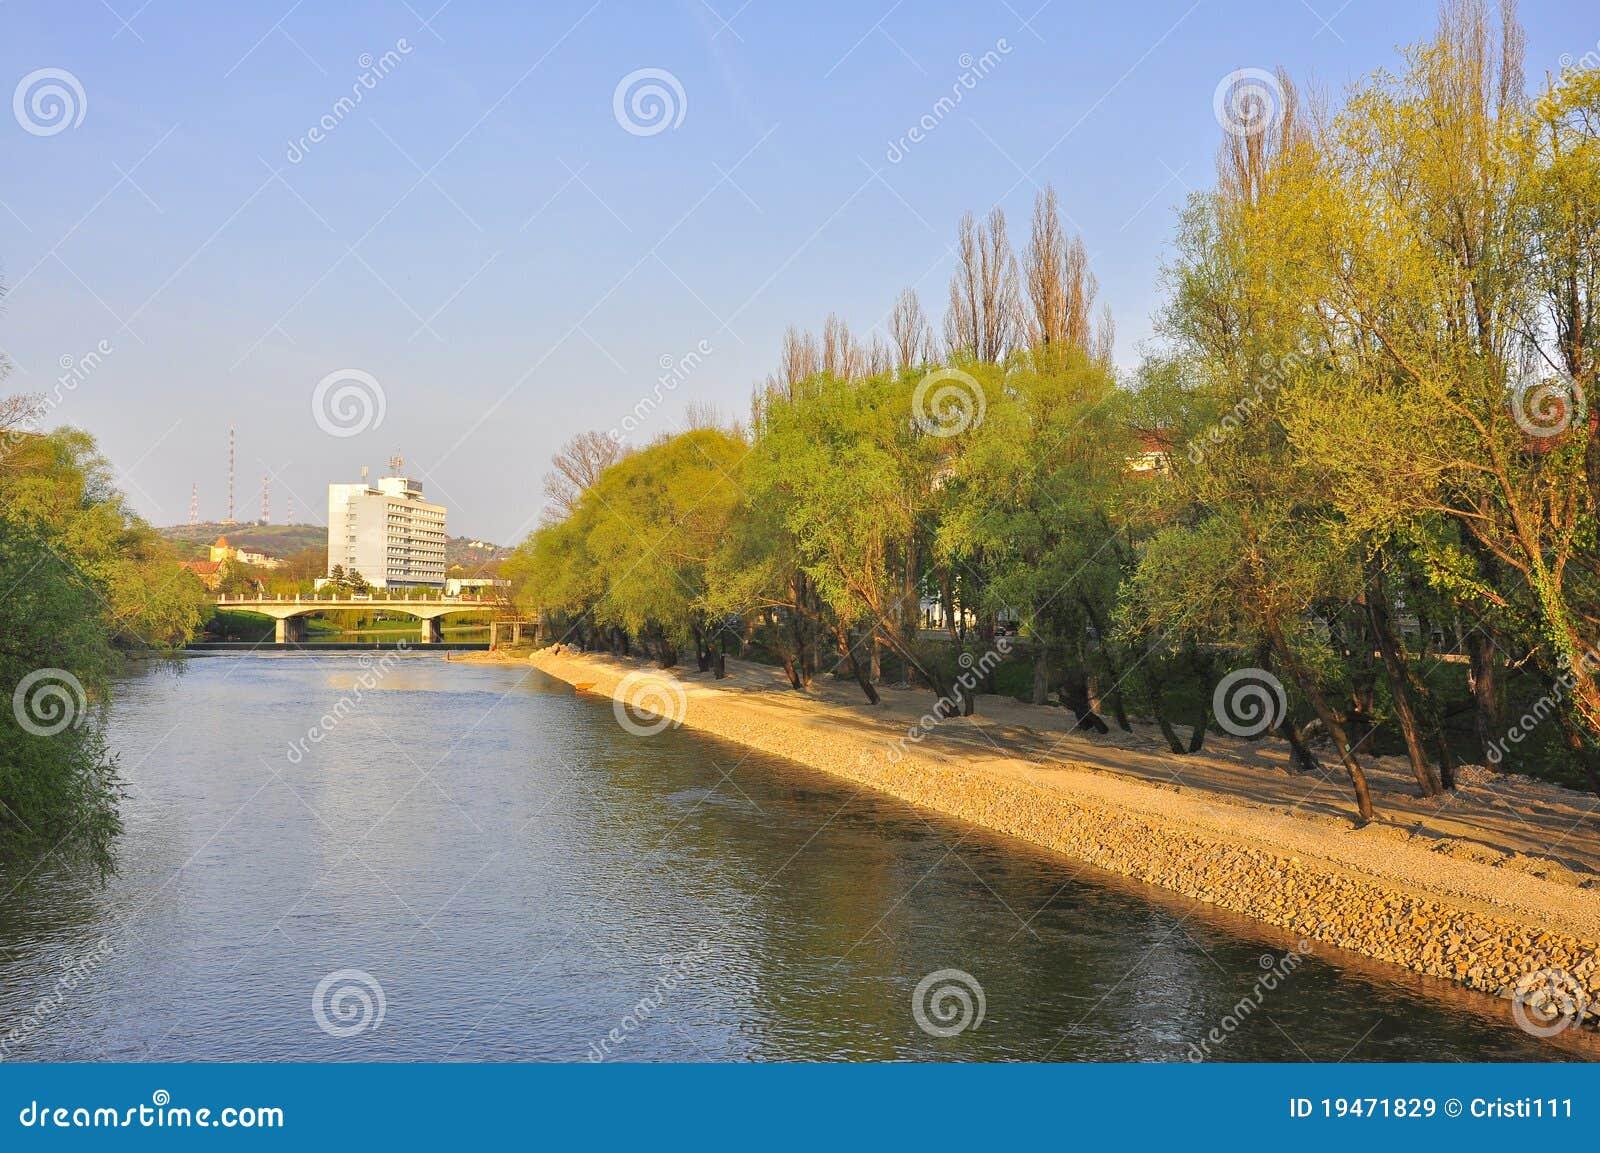 Cris river